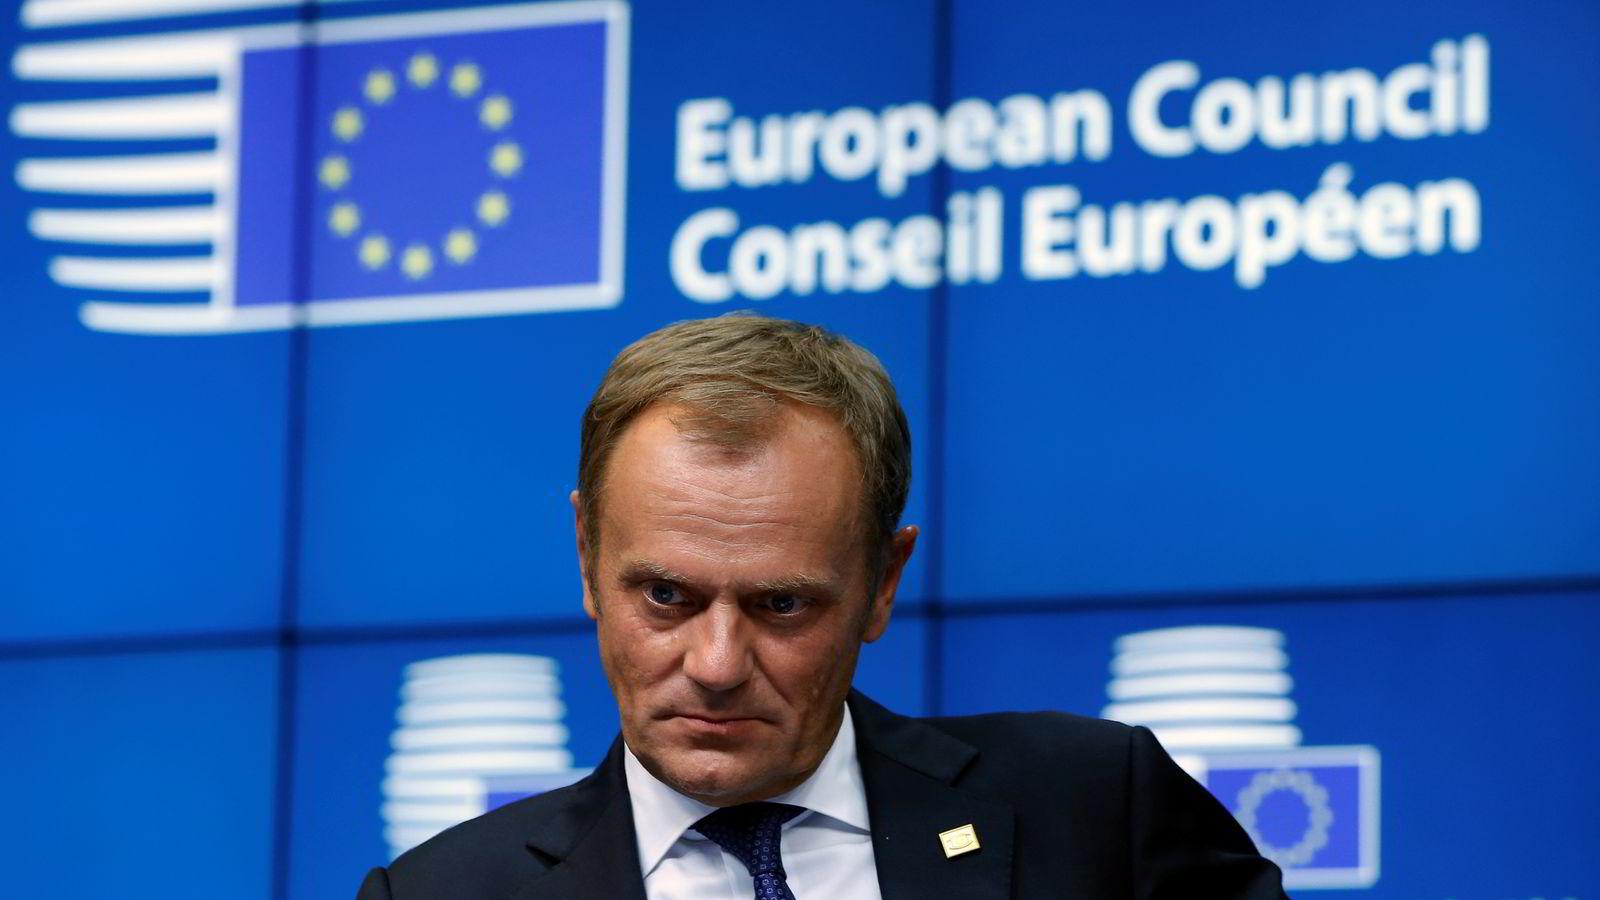 Polens statsminister Donald Tusk ble lørdag kveld valgt til EU-president. Foto: Yves Herman / Reuters / NTB scanpix